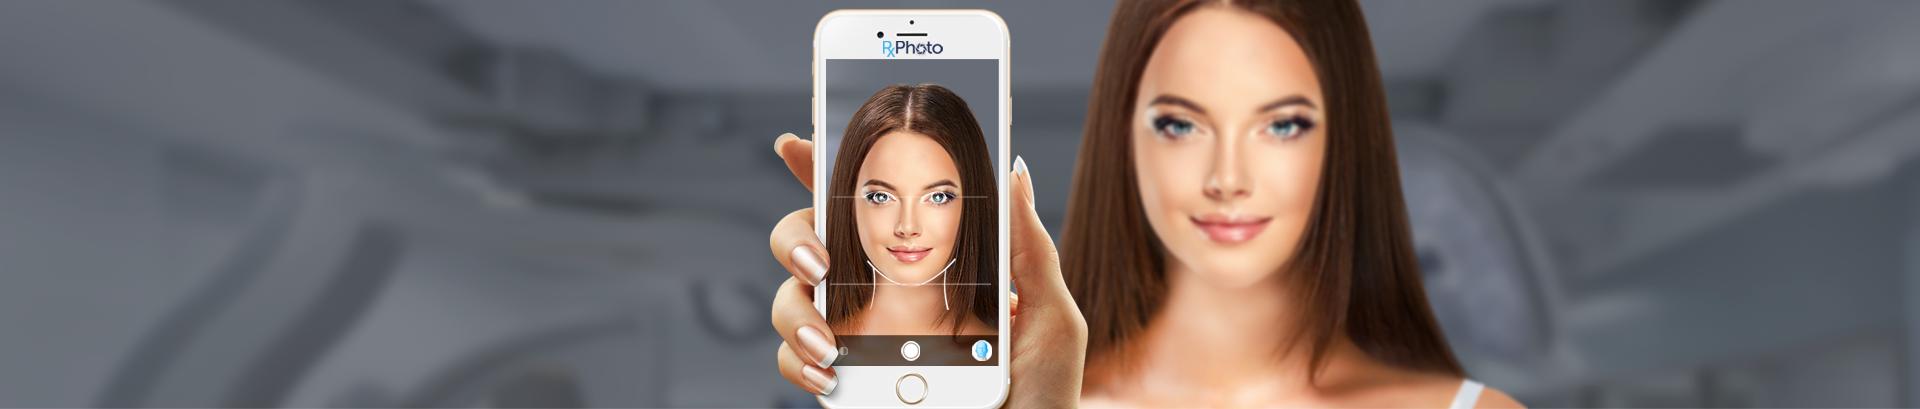 RxPhoto's mobile medical photography platform